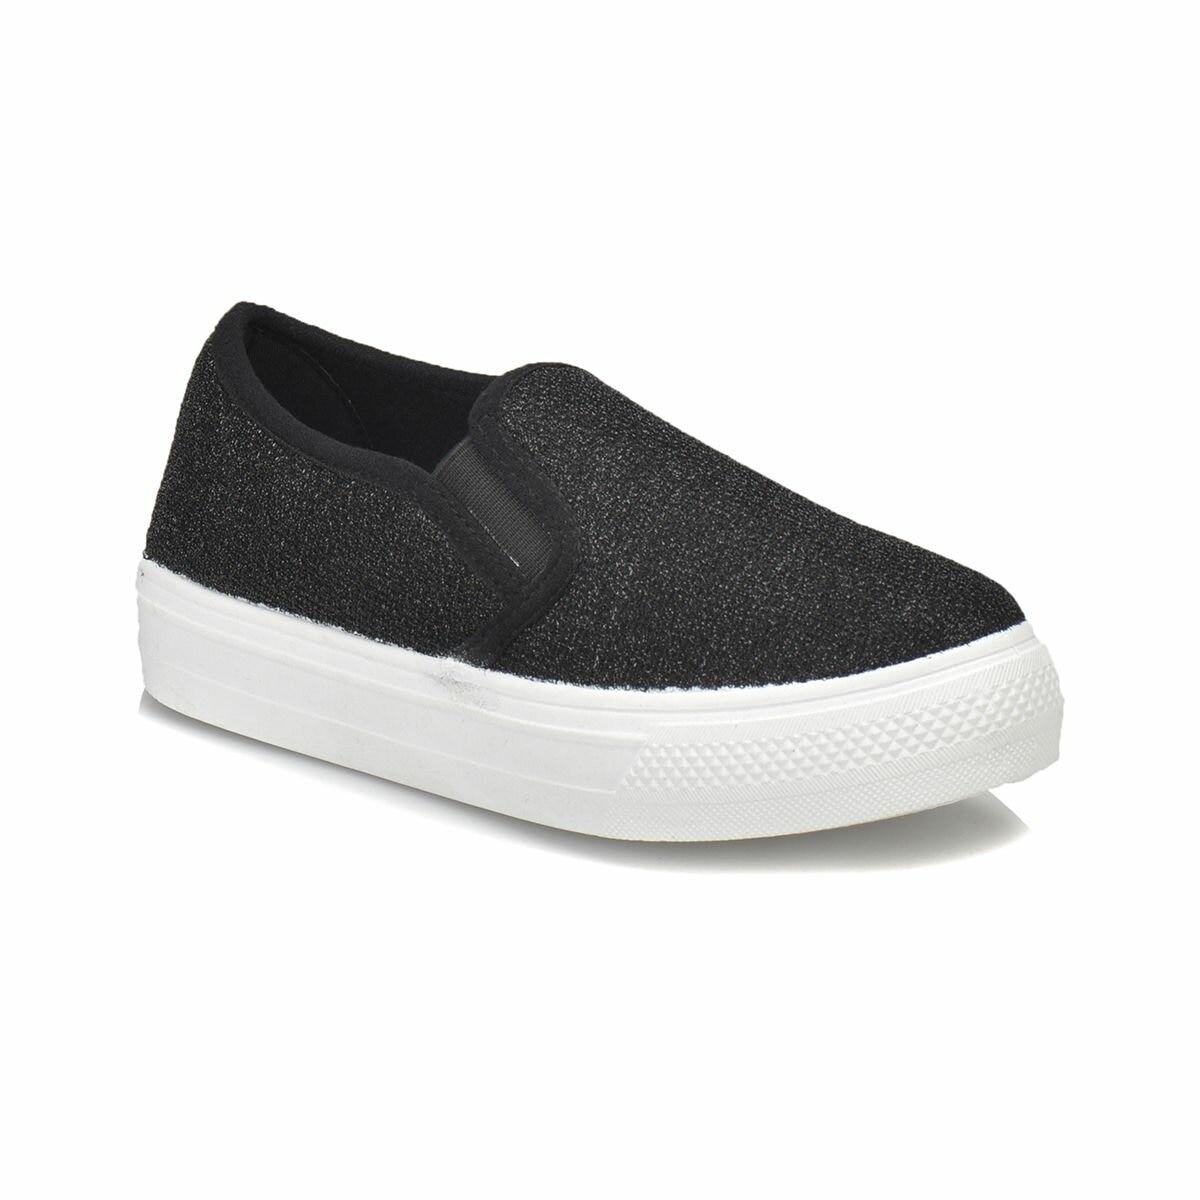 FLO ROSA Black Male Child Slip On Shoes KINETIX